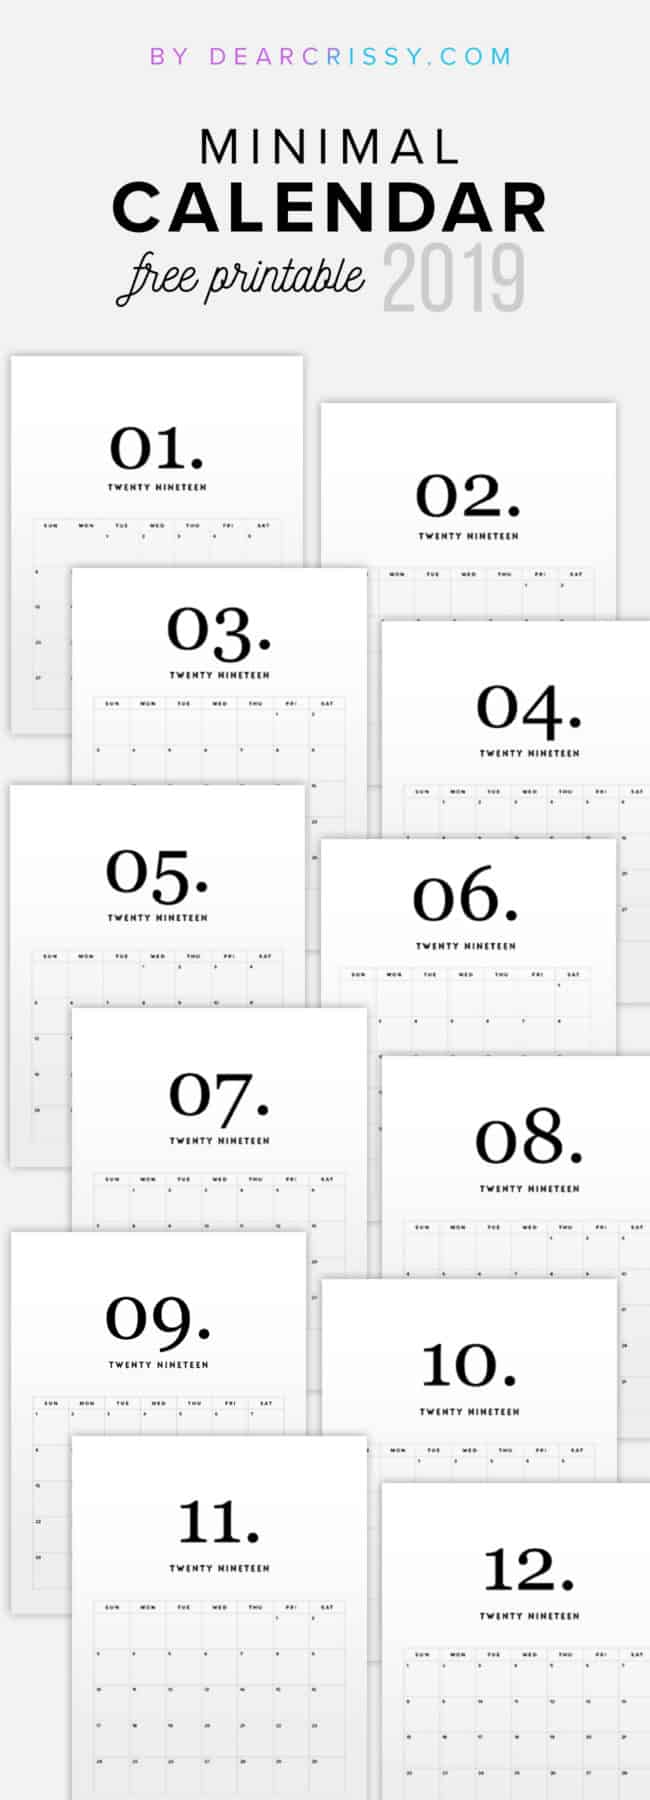 Free Printable 2019 Minimal Calendar - Modern Calendar - Minimalist Calendar - Clean White Calendar 2019 - #2019Calendar #Printable #Calendar #minimalist #modern #simple